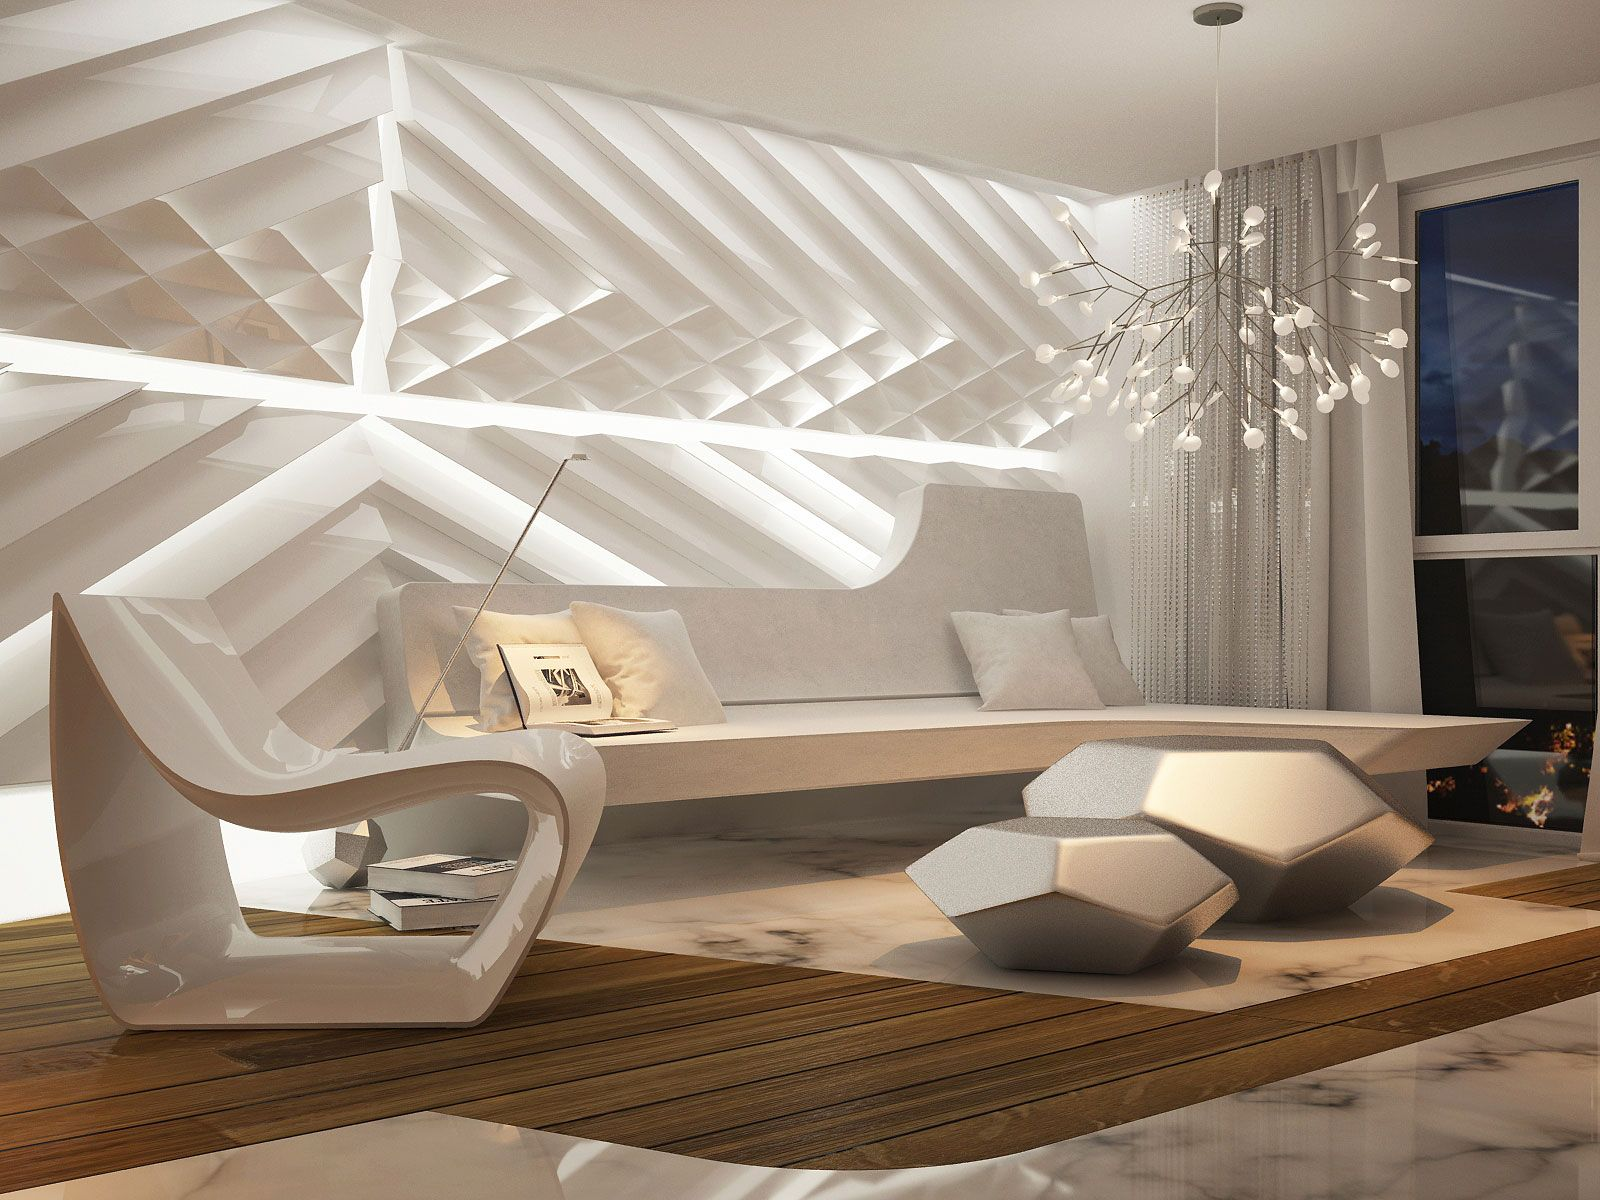 Heracleum Suspension and Mikyake Floor Lamp by Moooi